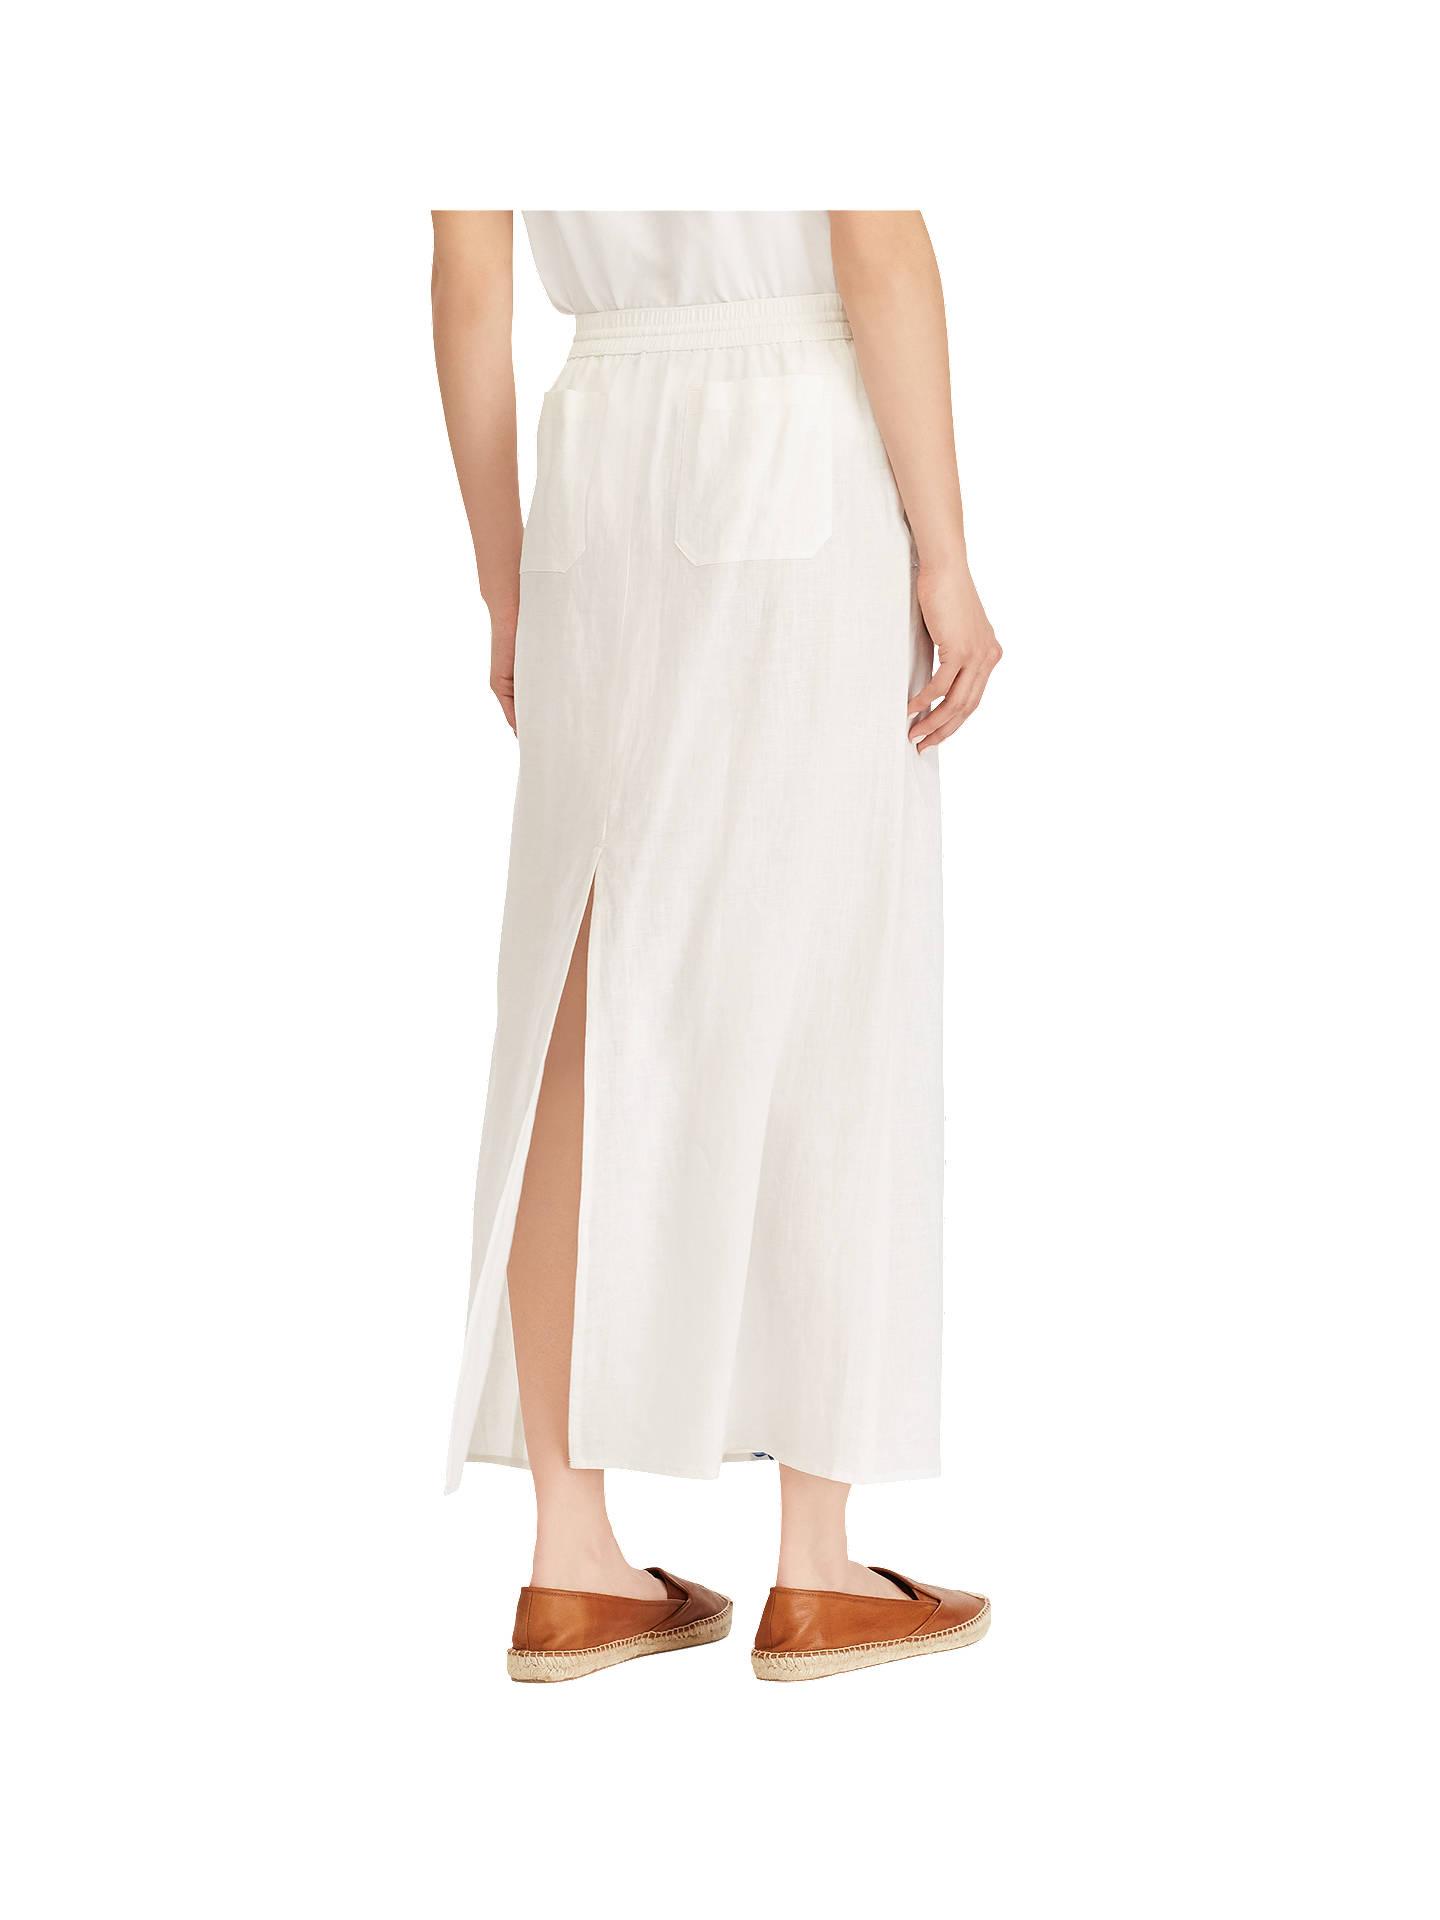 8083f3a63d ... Buy Lauren Ralph Lauren Orela Skirt